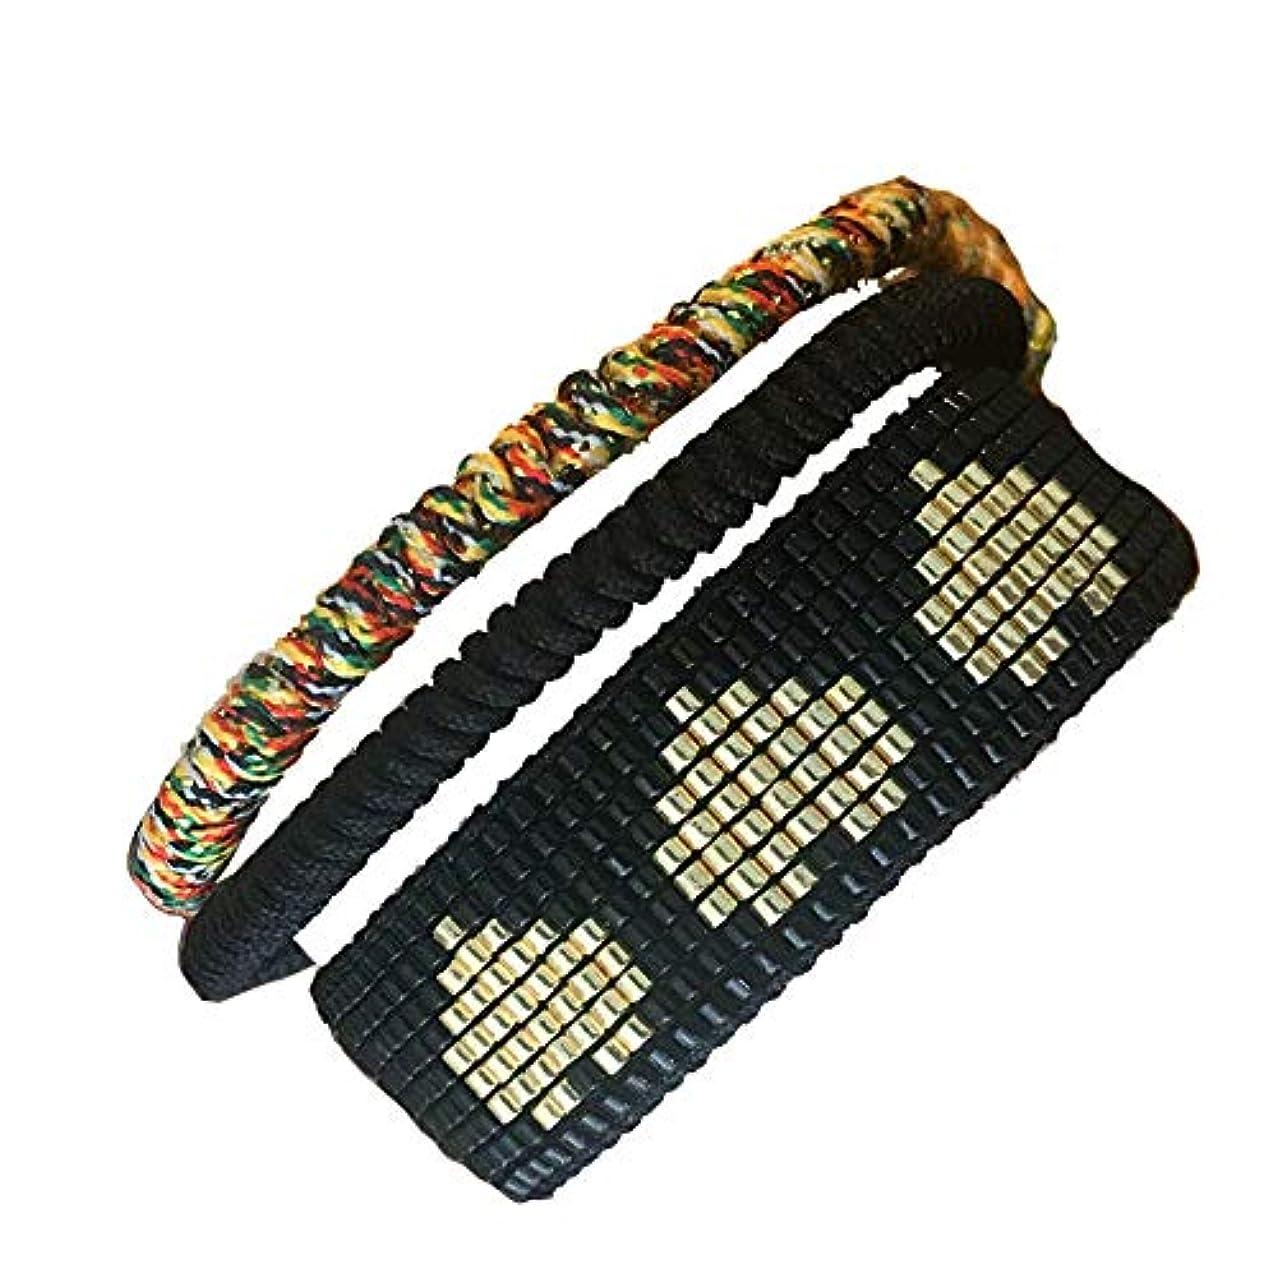 BALIBALI Miyuki Seed Beads Bracelet Evil Eye Star Lips Bracelet Cuff Women Bangle Hot Summer Charms Loom Woven Jewelry